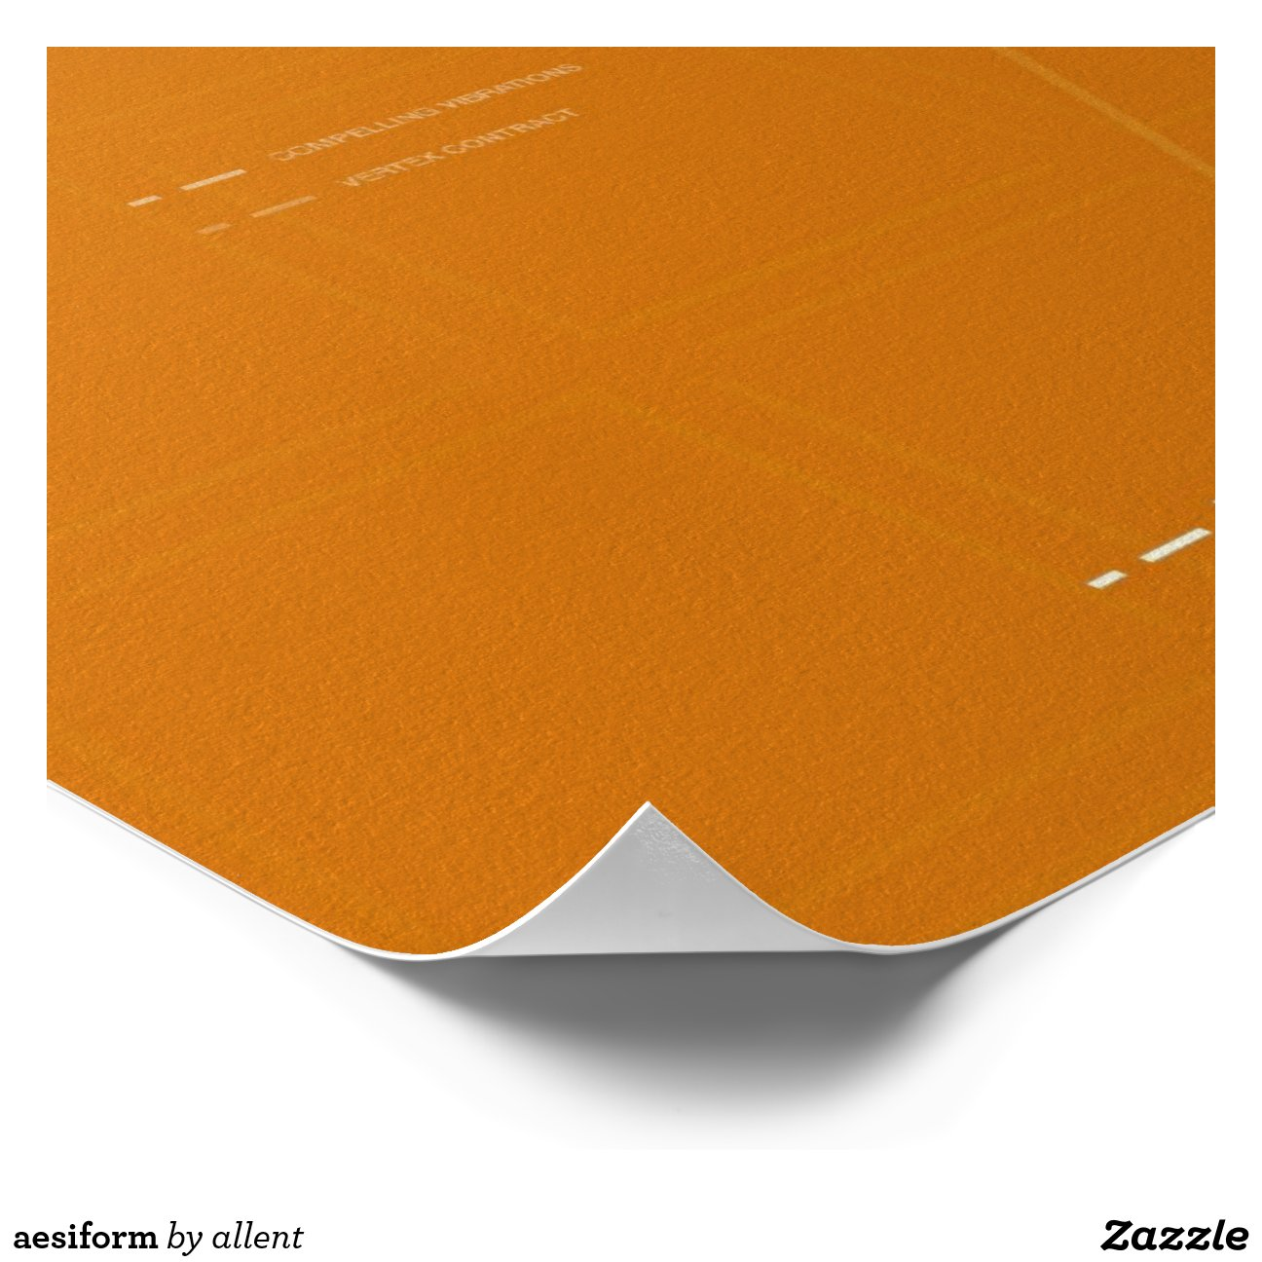 aesiform poster  Zazzle Elysium Poster